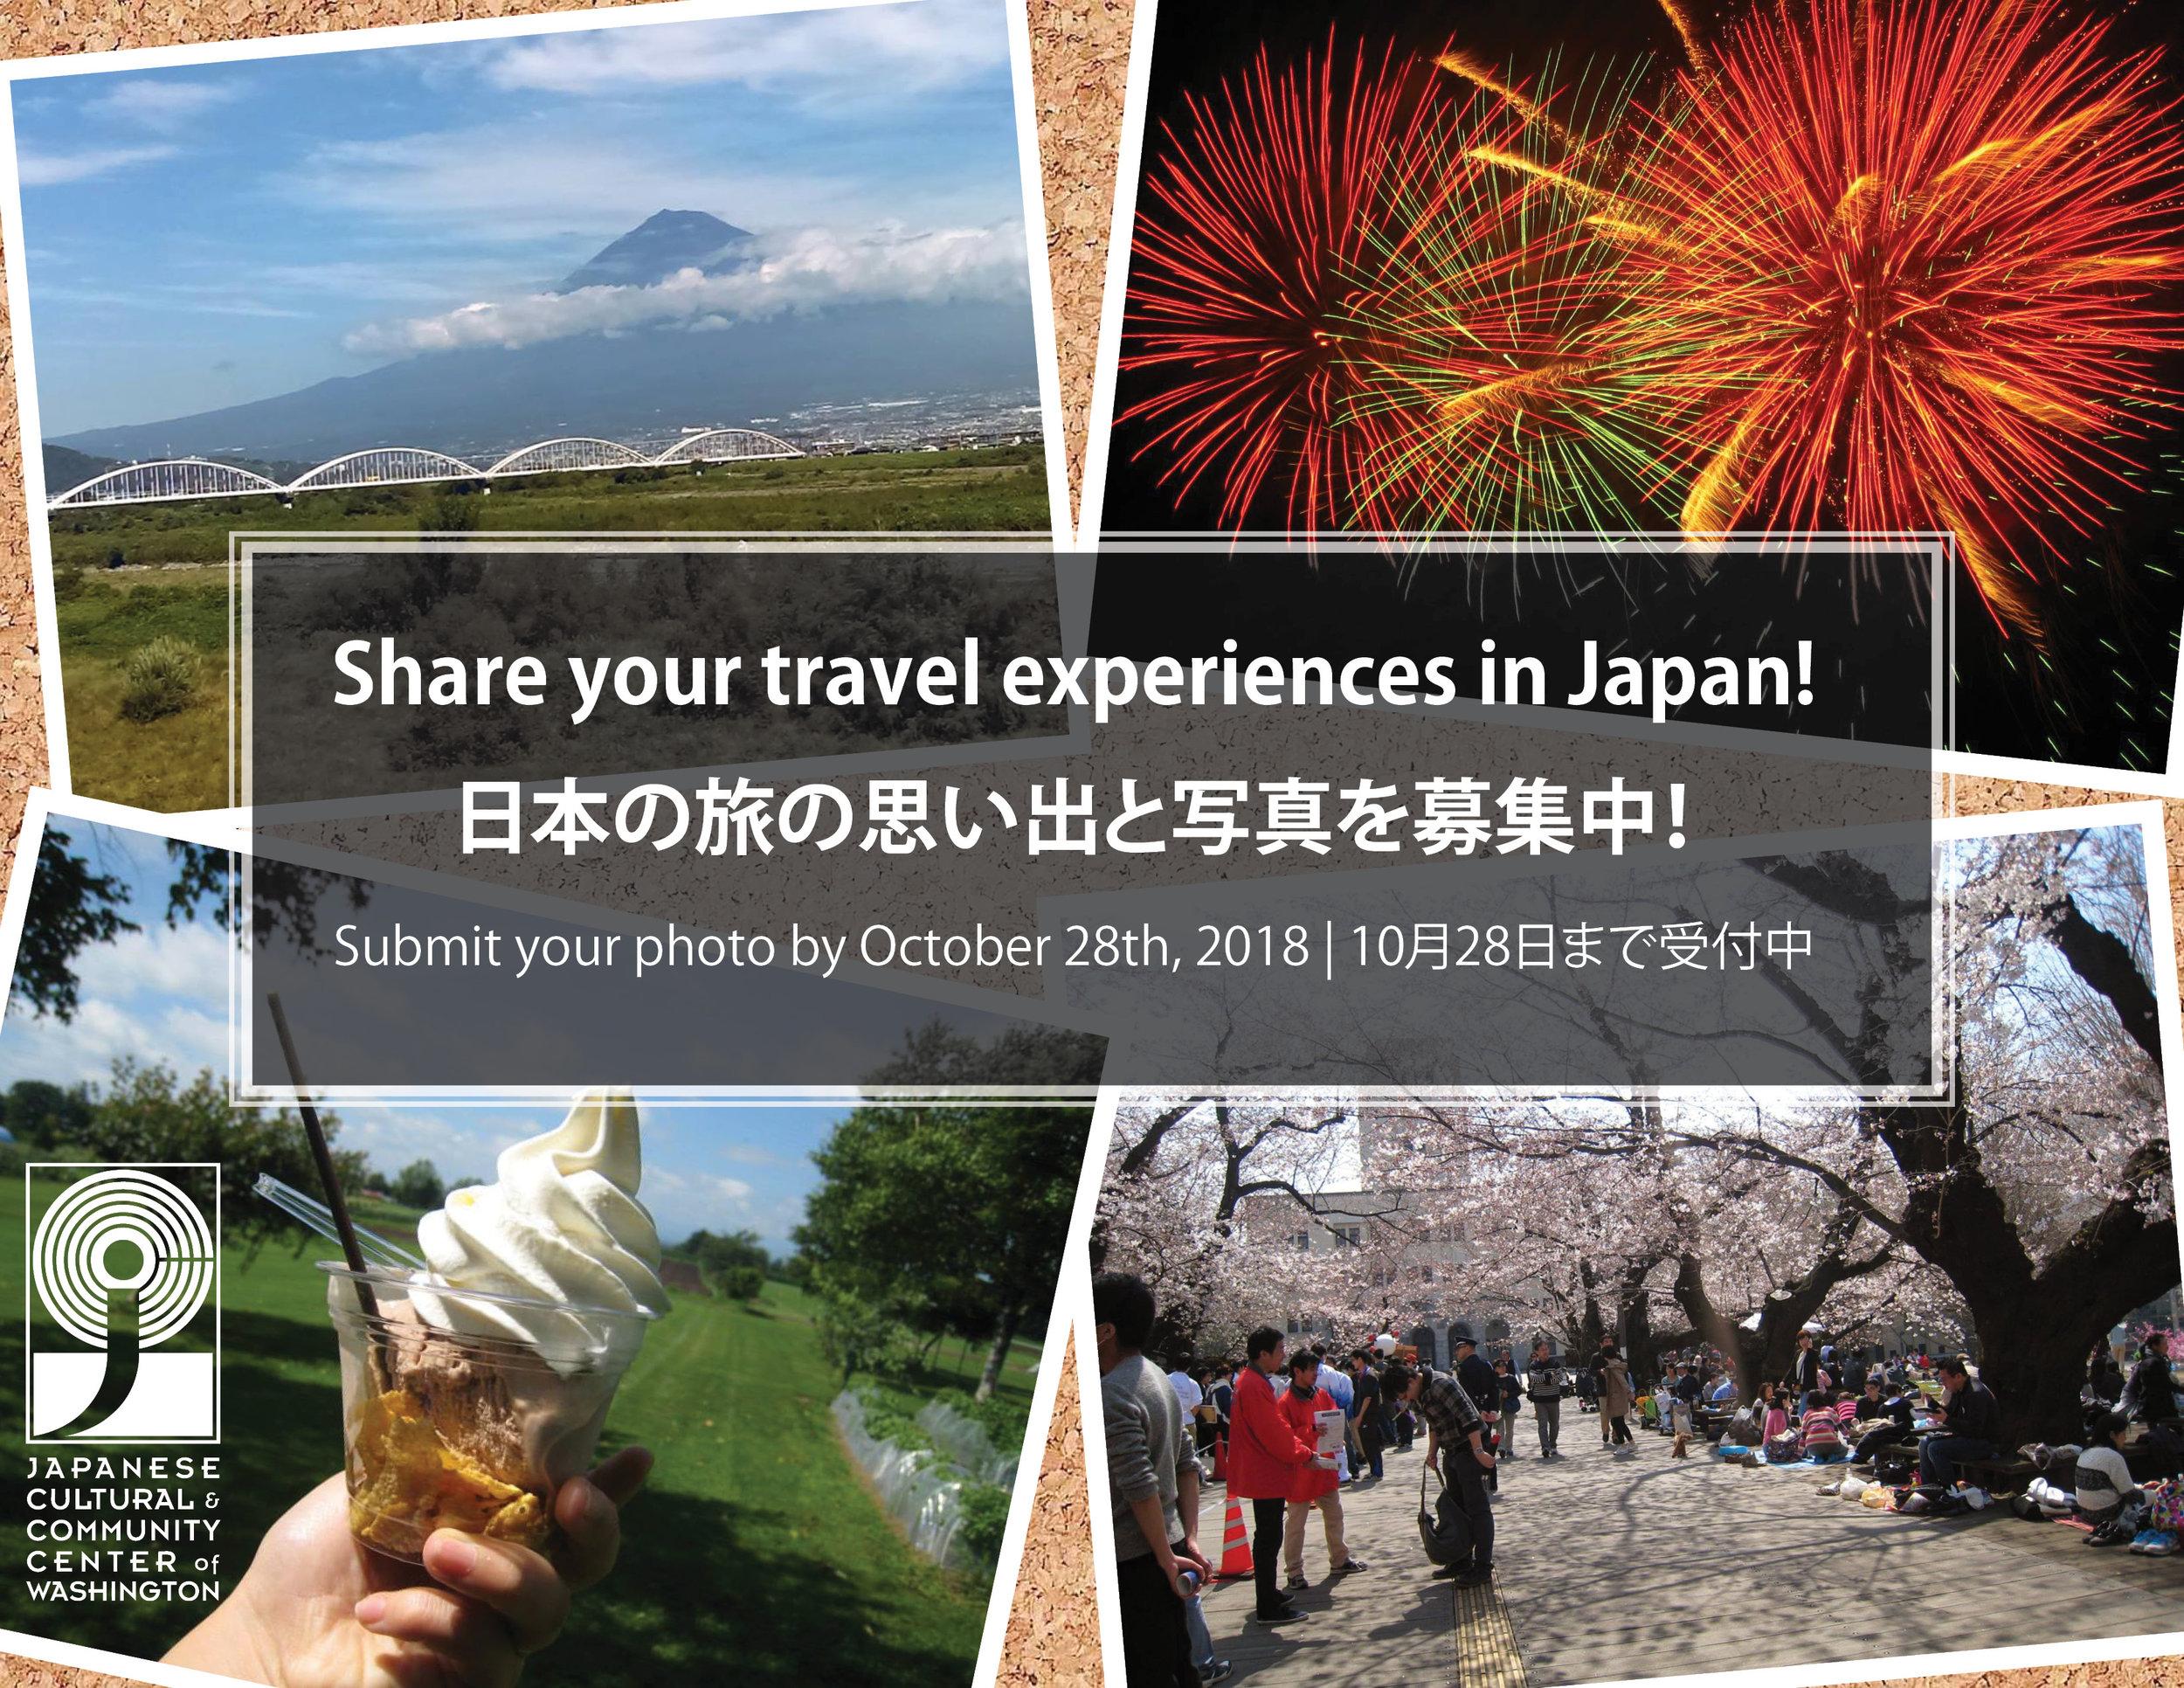 Advertisement10102018_ShareYourTravelExperiencesInJapan.jpg